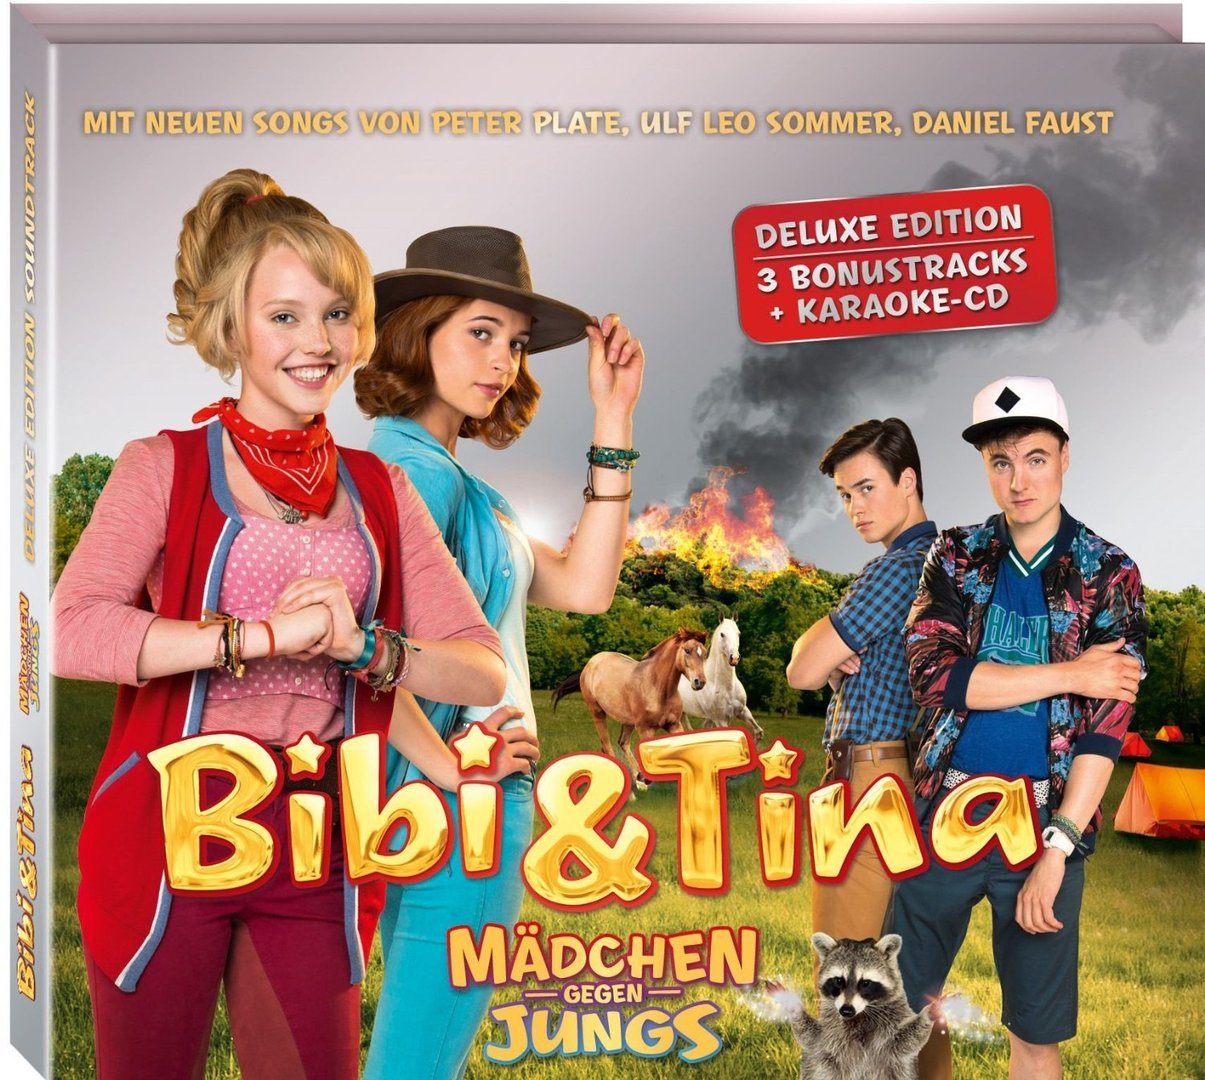 Bibi Und Tina Jungs Gegen Mädchen Mädchen Gegen Jungs